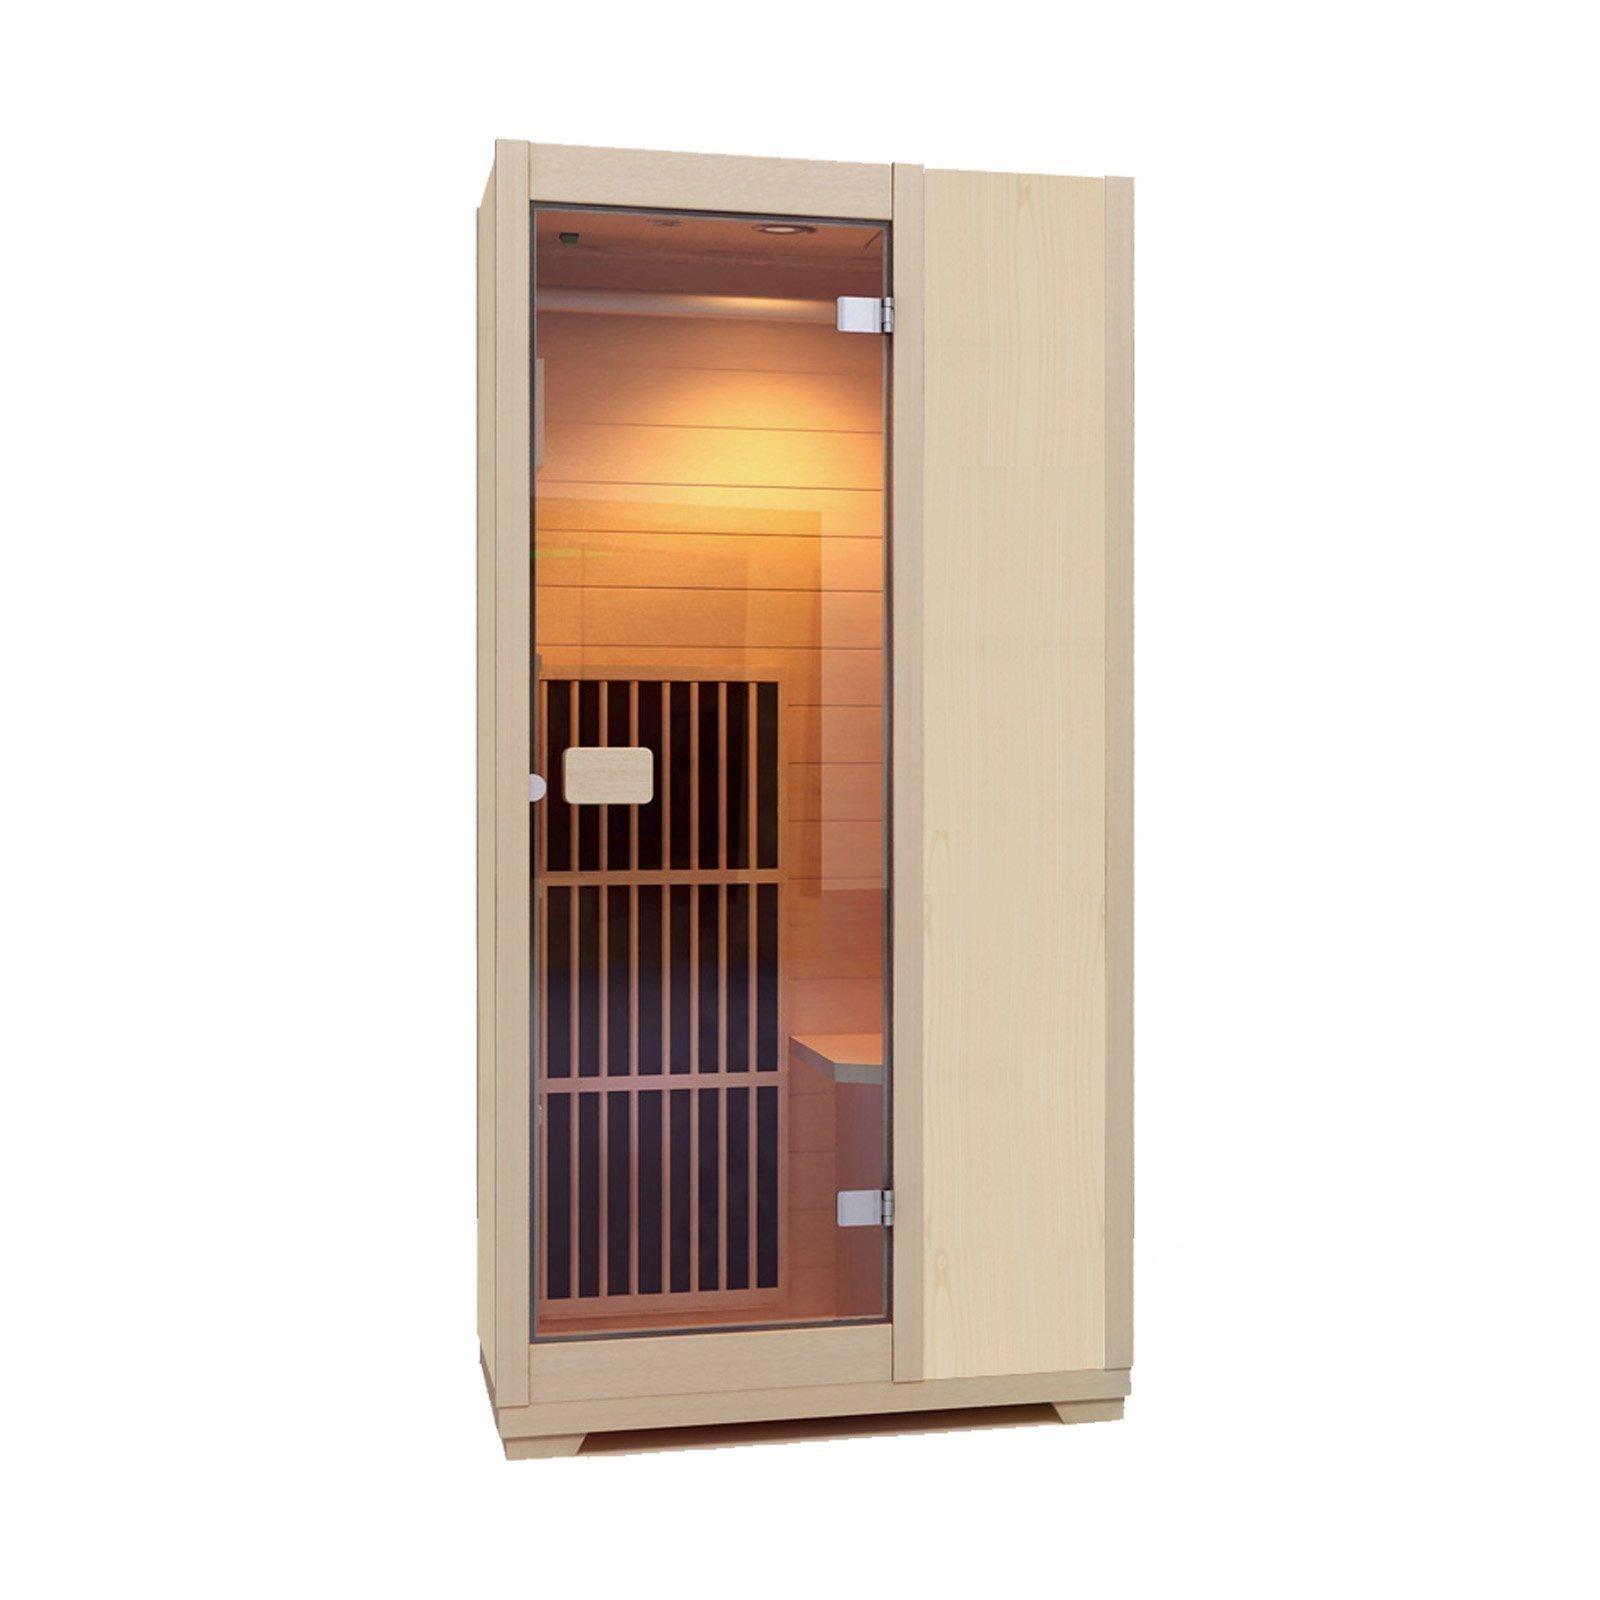 Sauna Infrarouge Zen 'Brighton' ZIV015